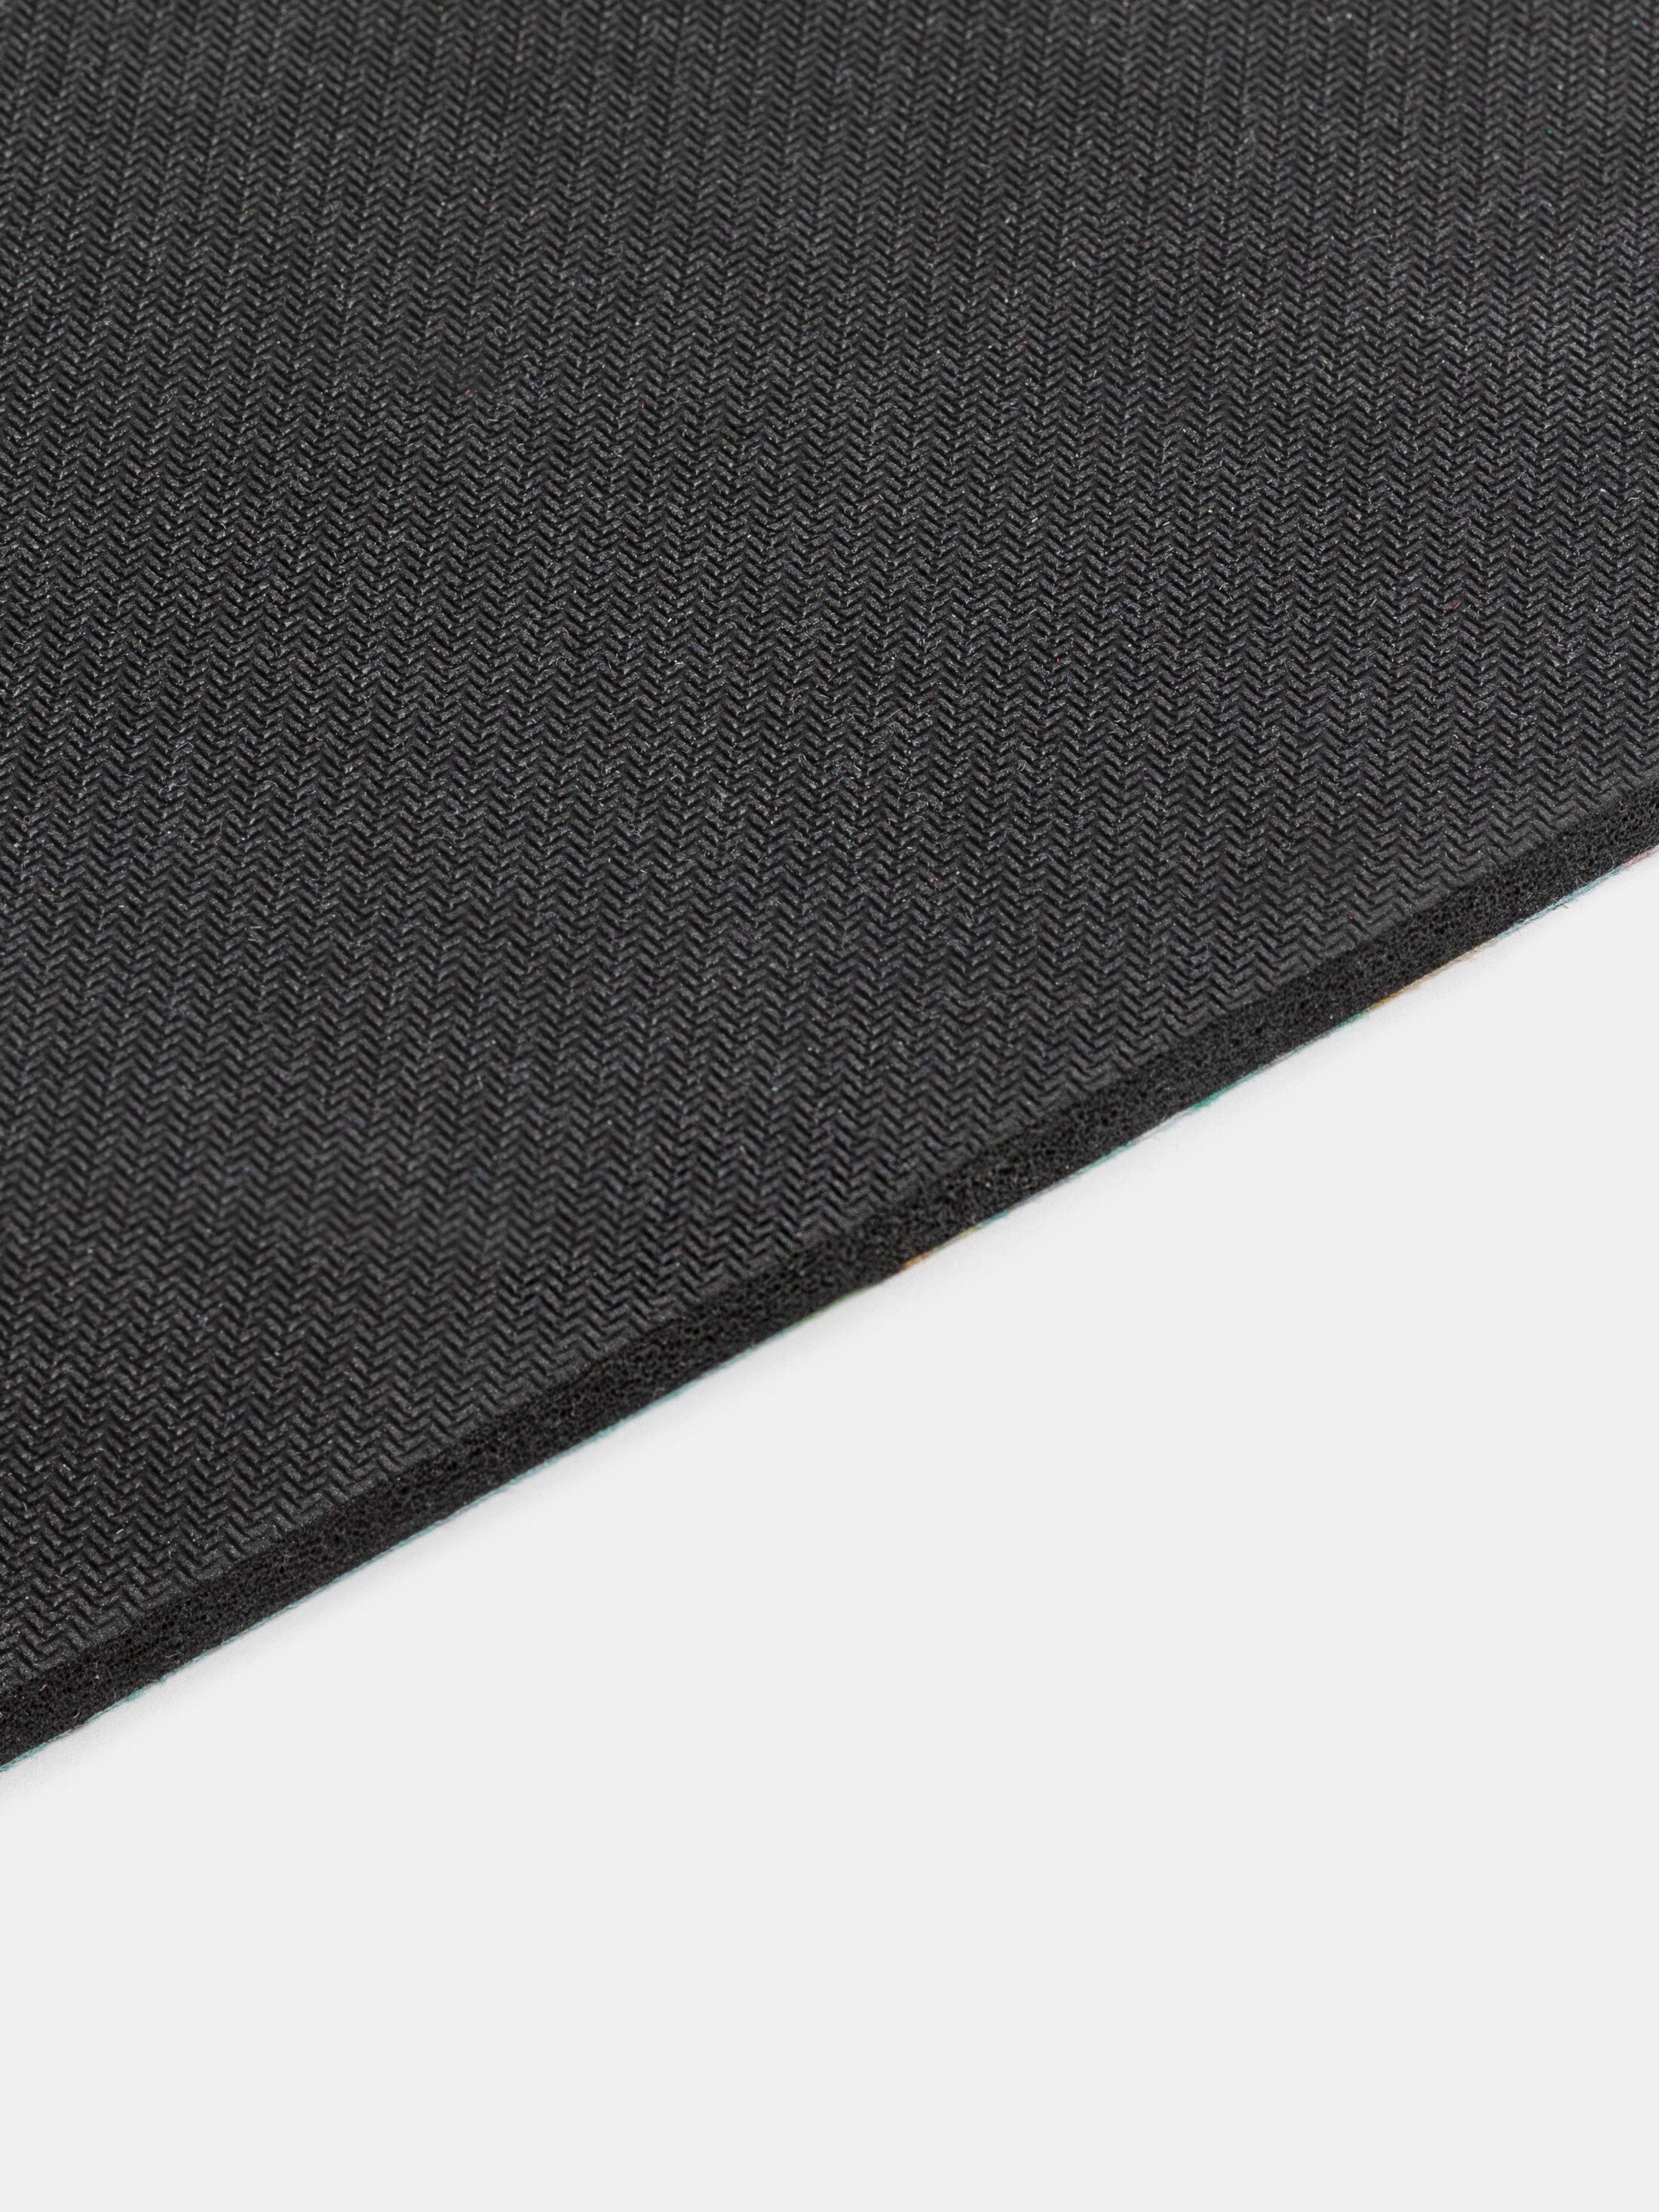 stampa su tappetino mouse